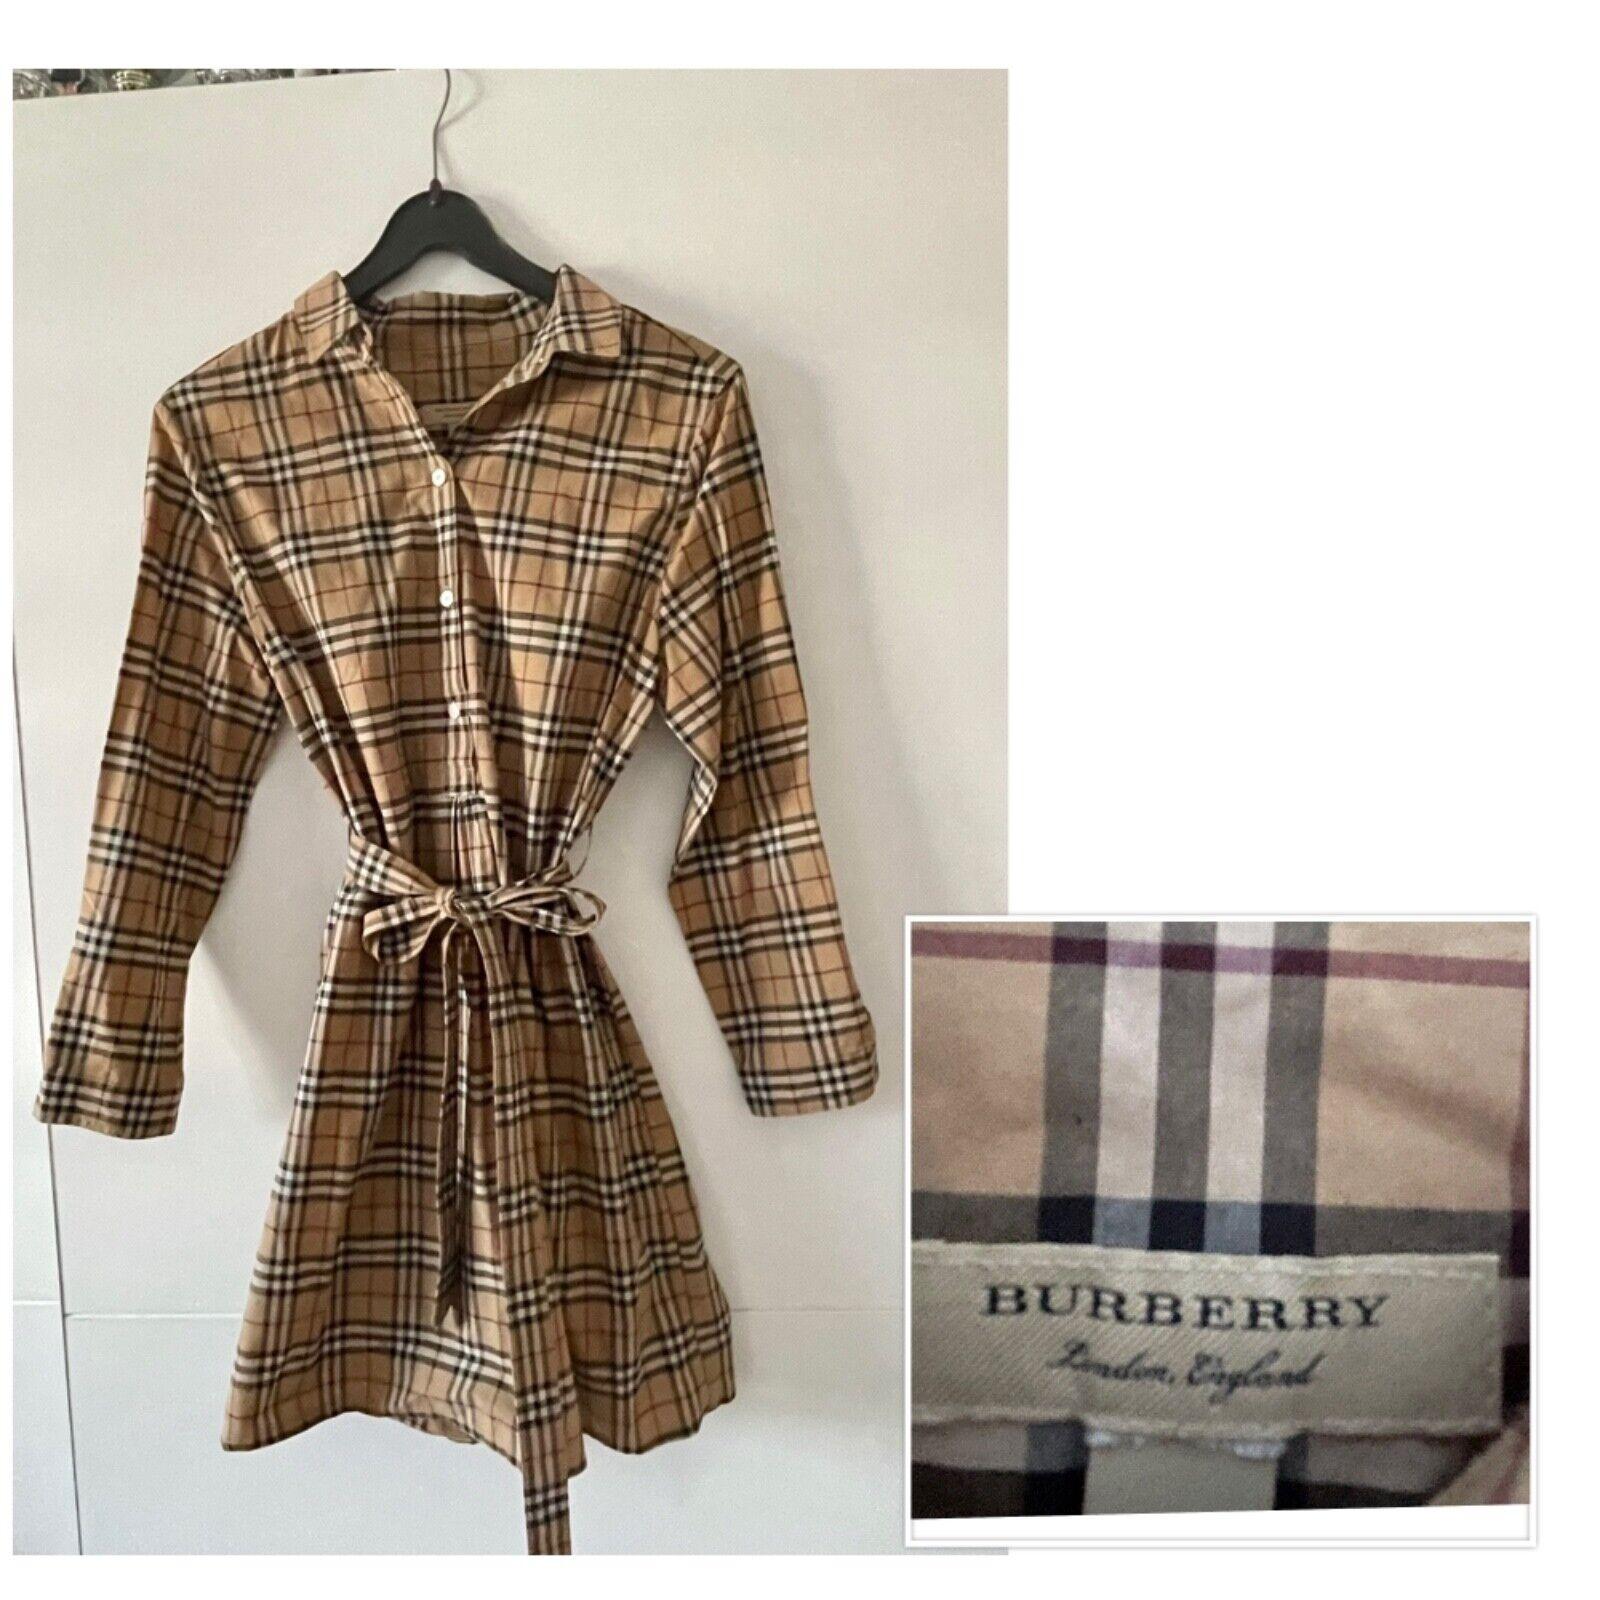 Burberry Kleid Größe 36/38